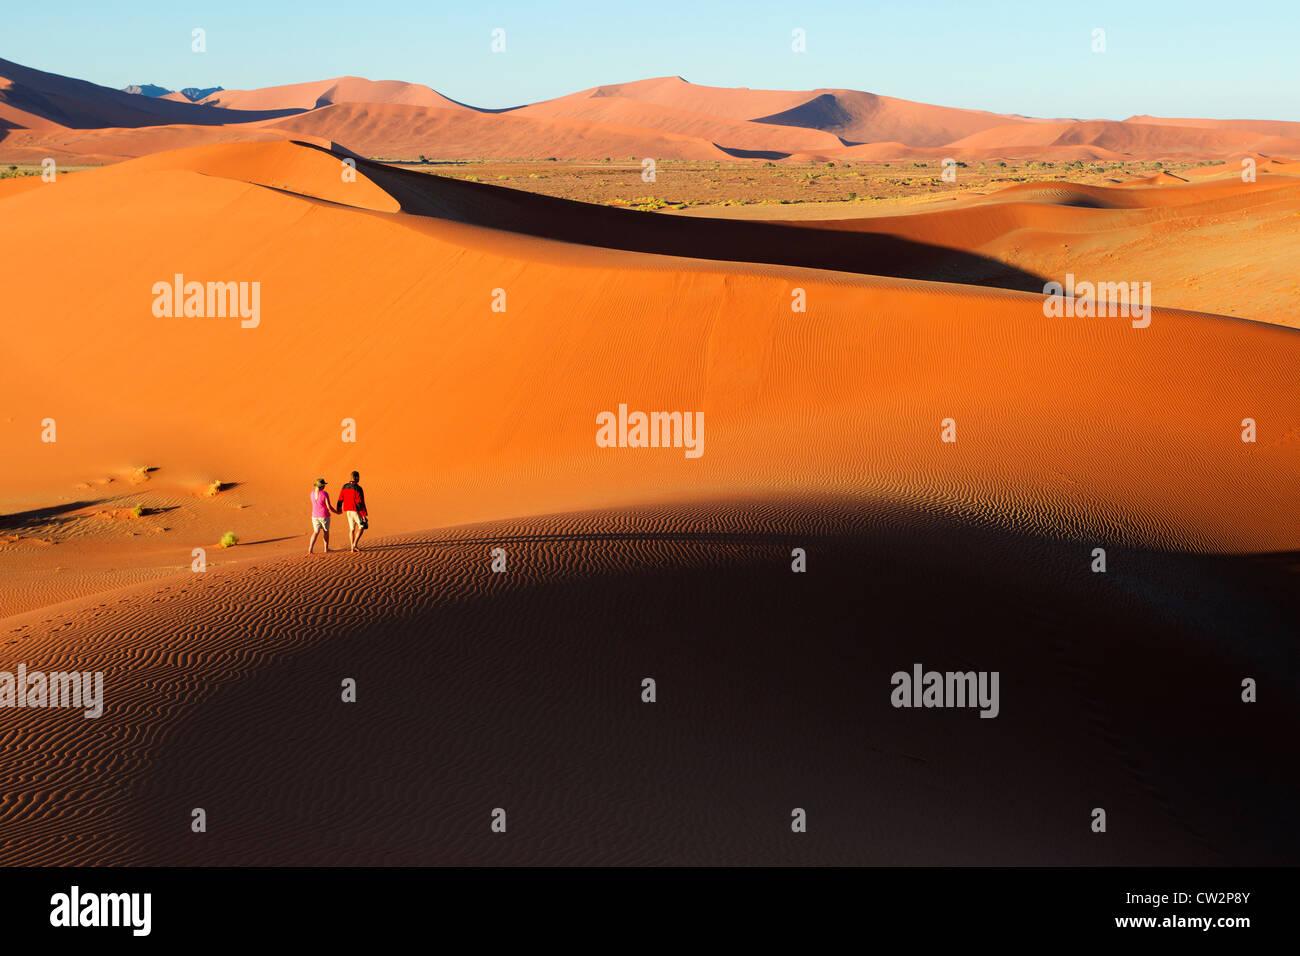 Paare, die am Rand der Sanddünen, Soussvlei, Namibia. Stockbild